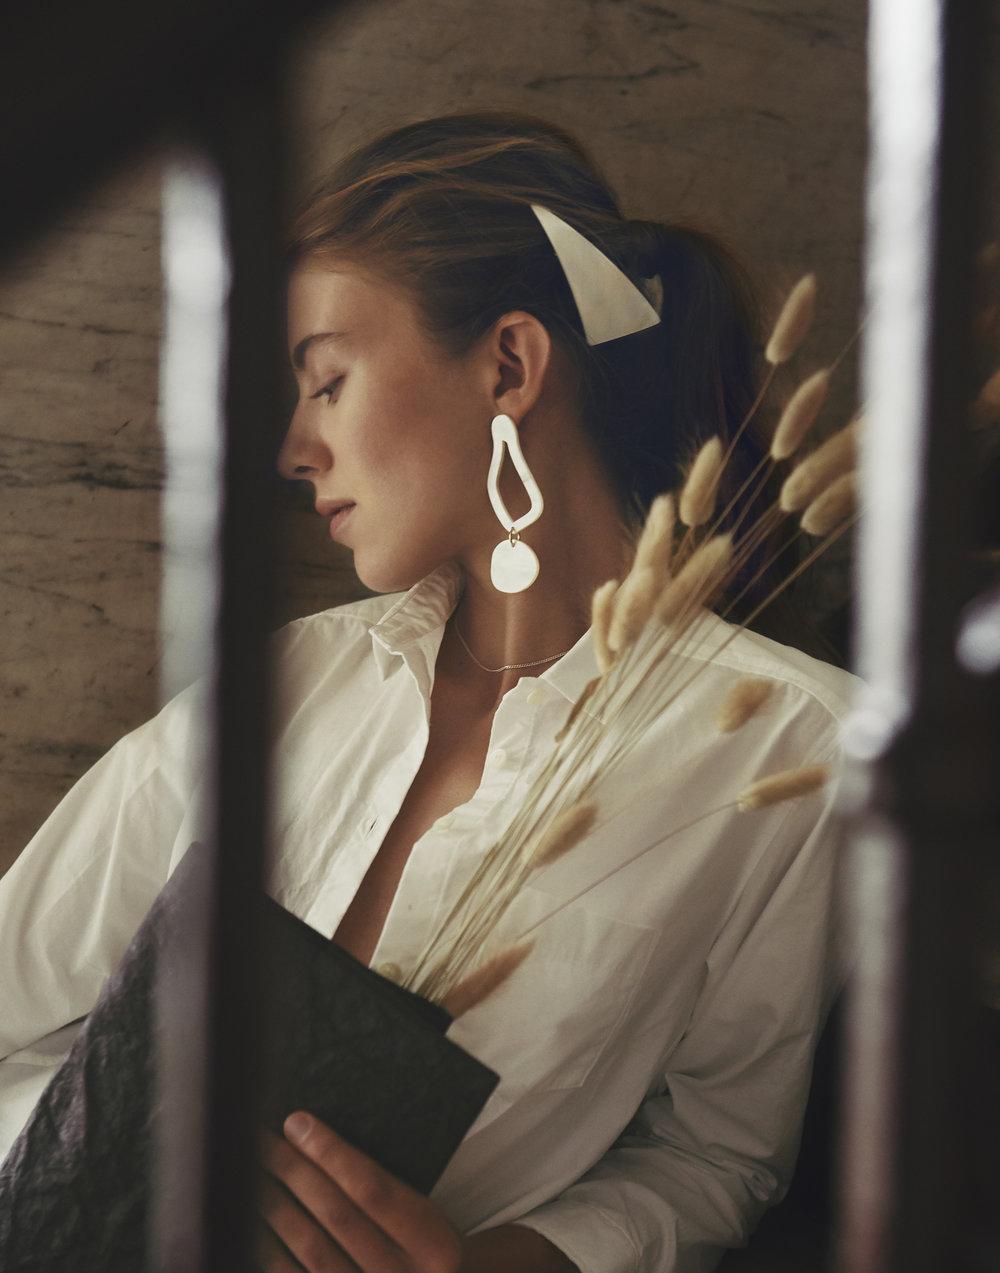 Shirts : Freckle,   Bag: KAMIYA, Jewelry & Hair accessory: sAn